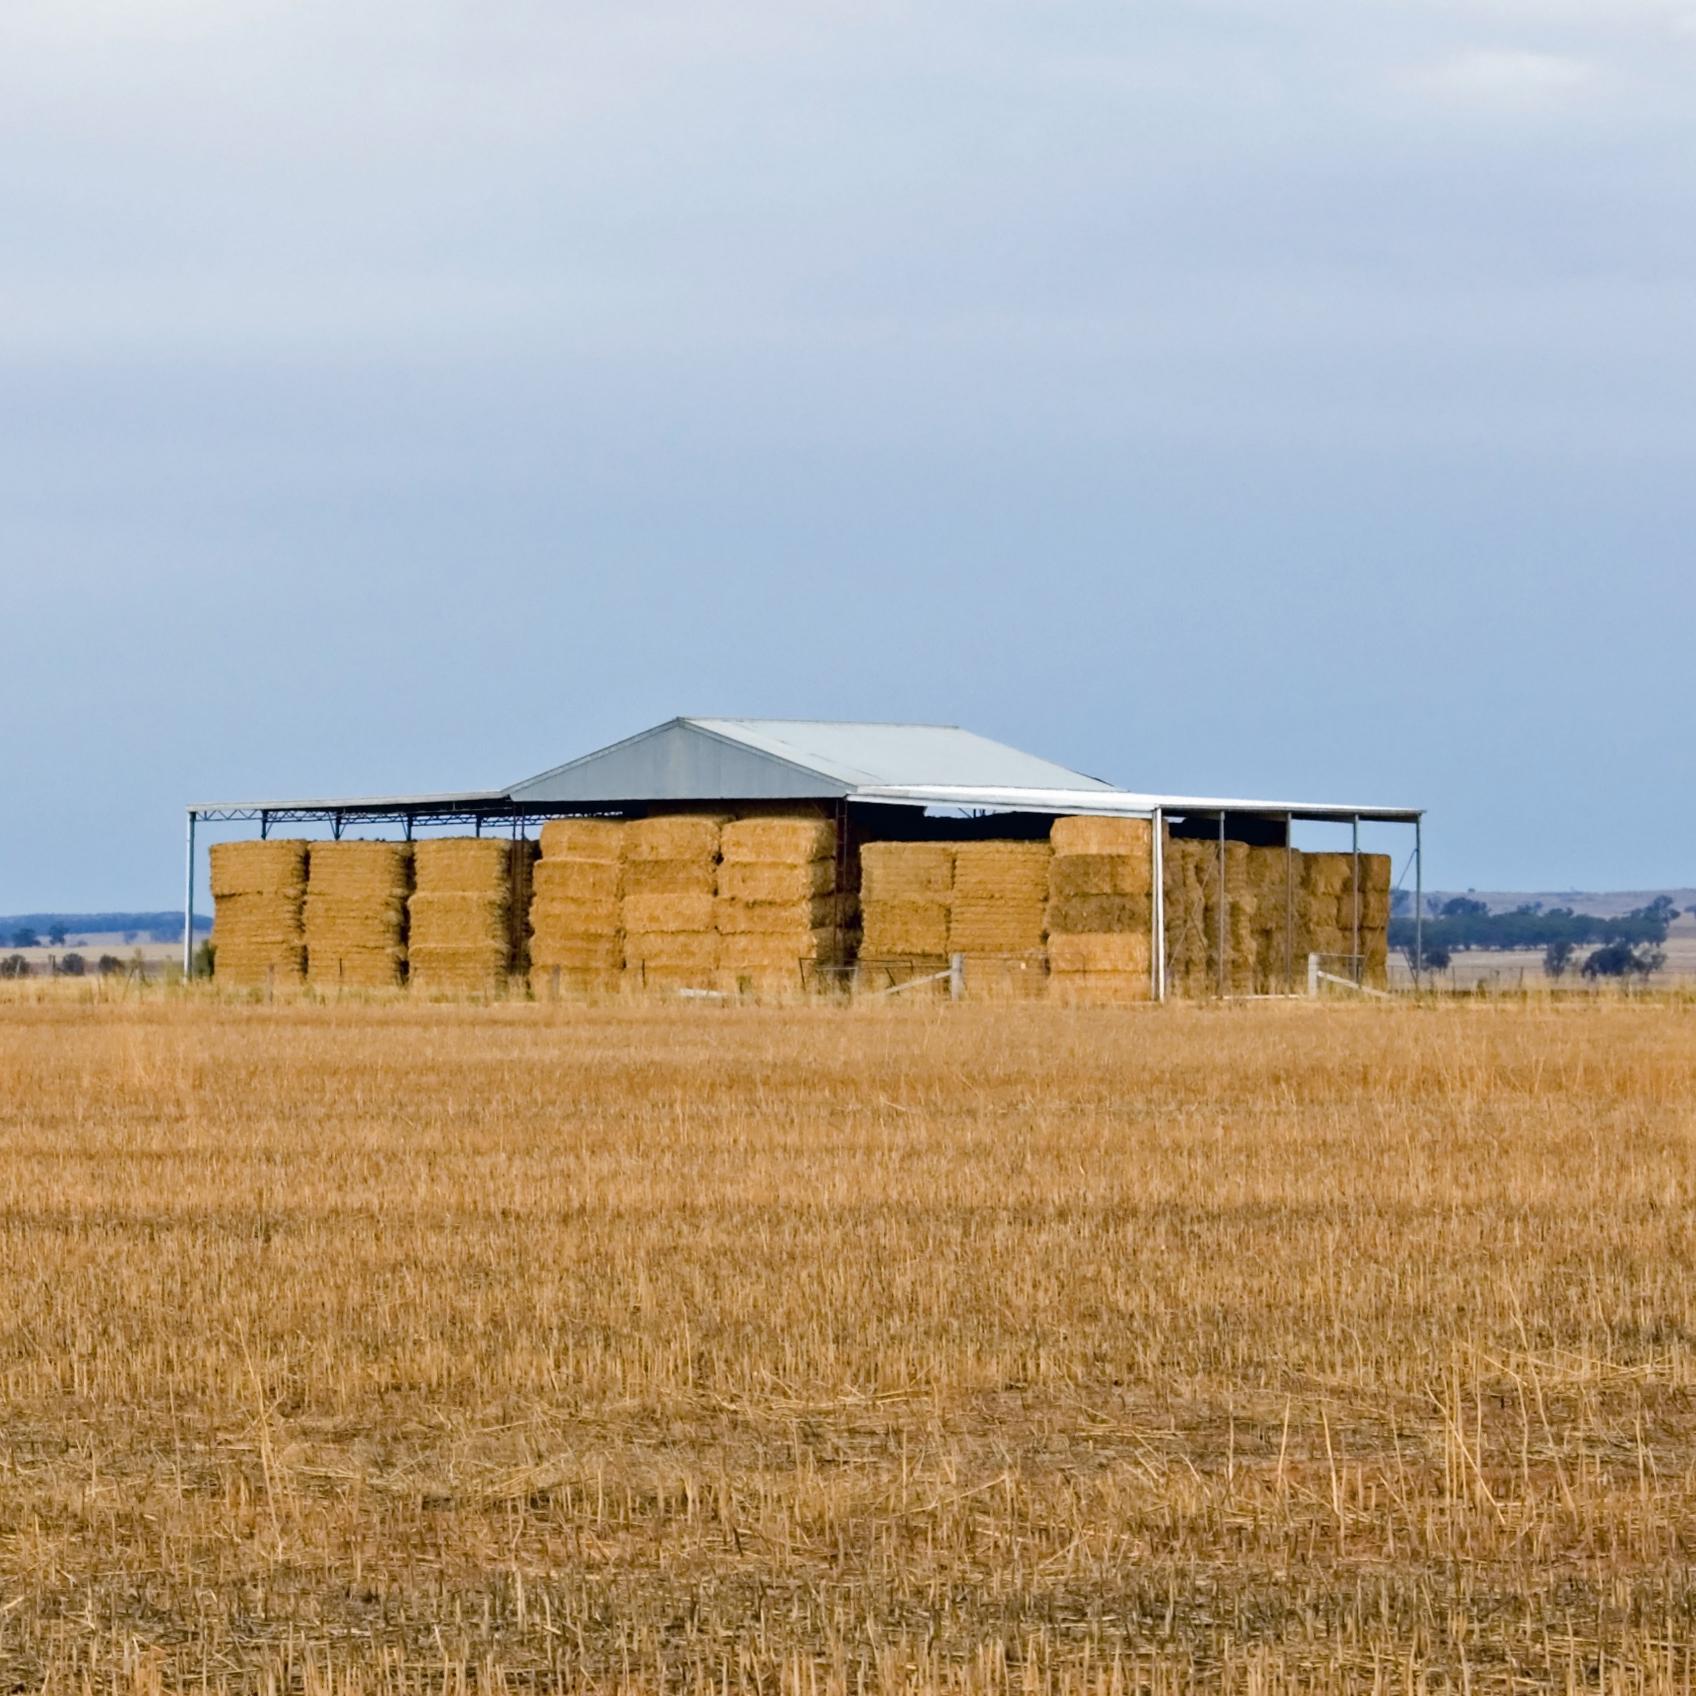 LARGE SQUARE BALE TWINE, Agri Novatex Australia